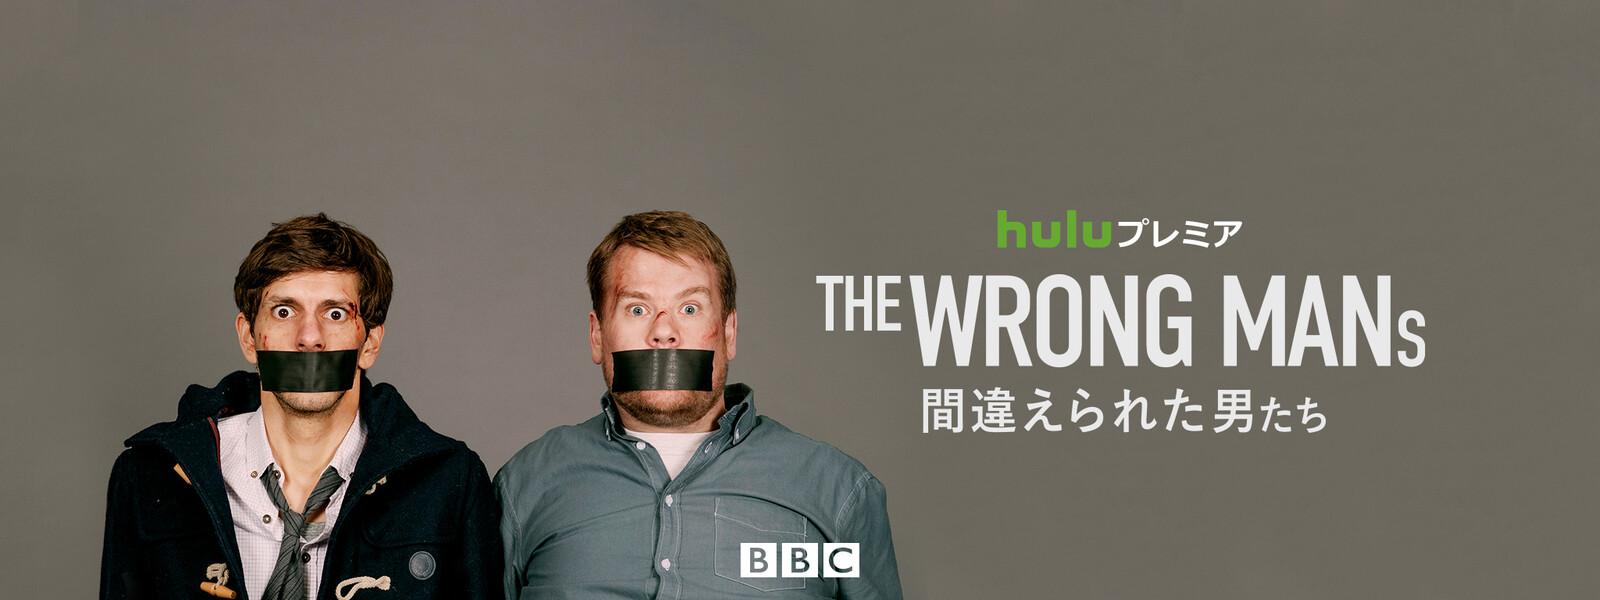 THE WRONG MANS/間違えられた男たち シーズン2 動画